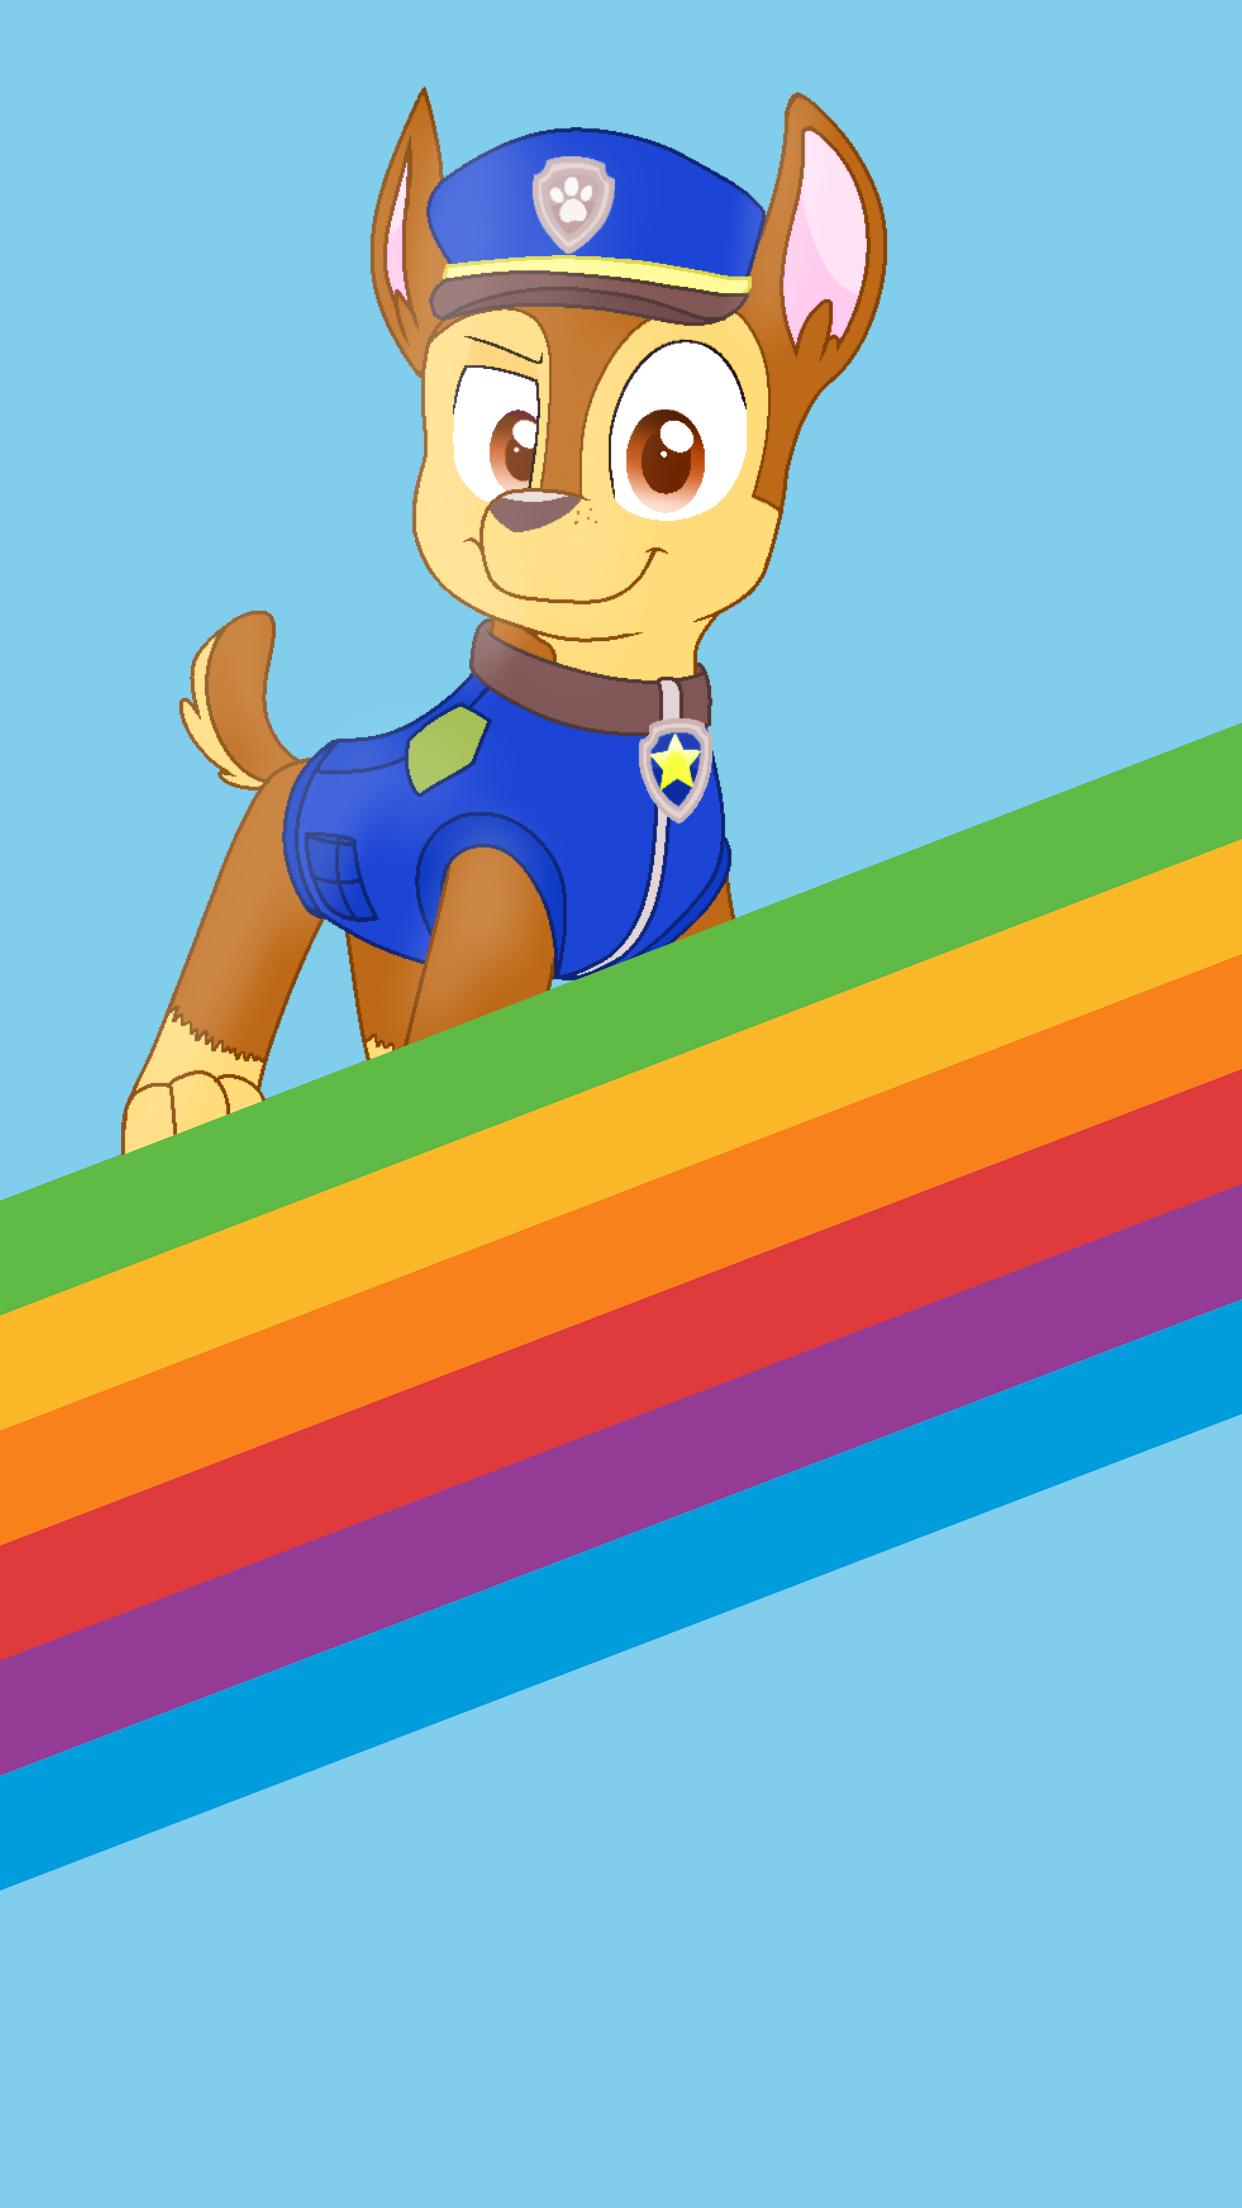 Apple Iphone Wallpaper Chase Rainbow Stripe Chase Paw Patrol Paw Patrol Birthday Paw Patrol Characters